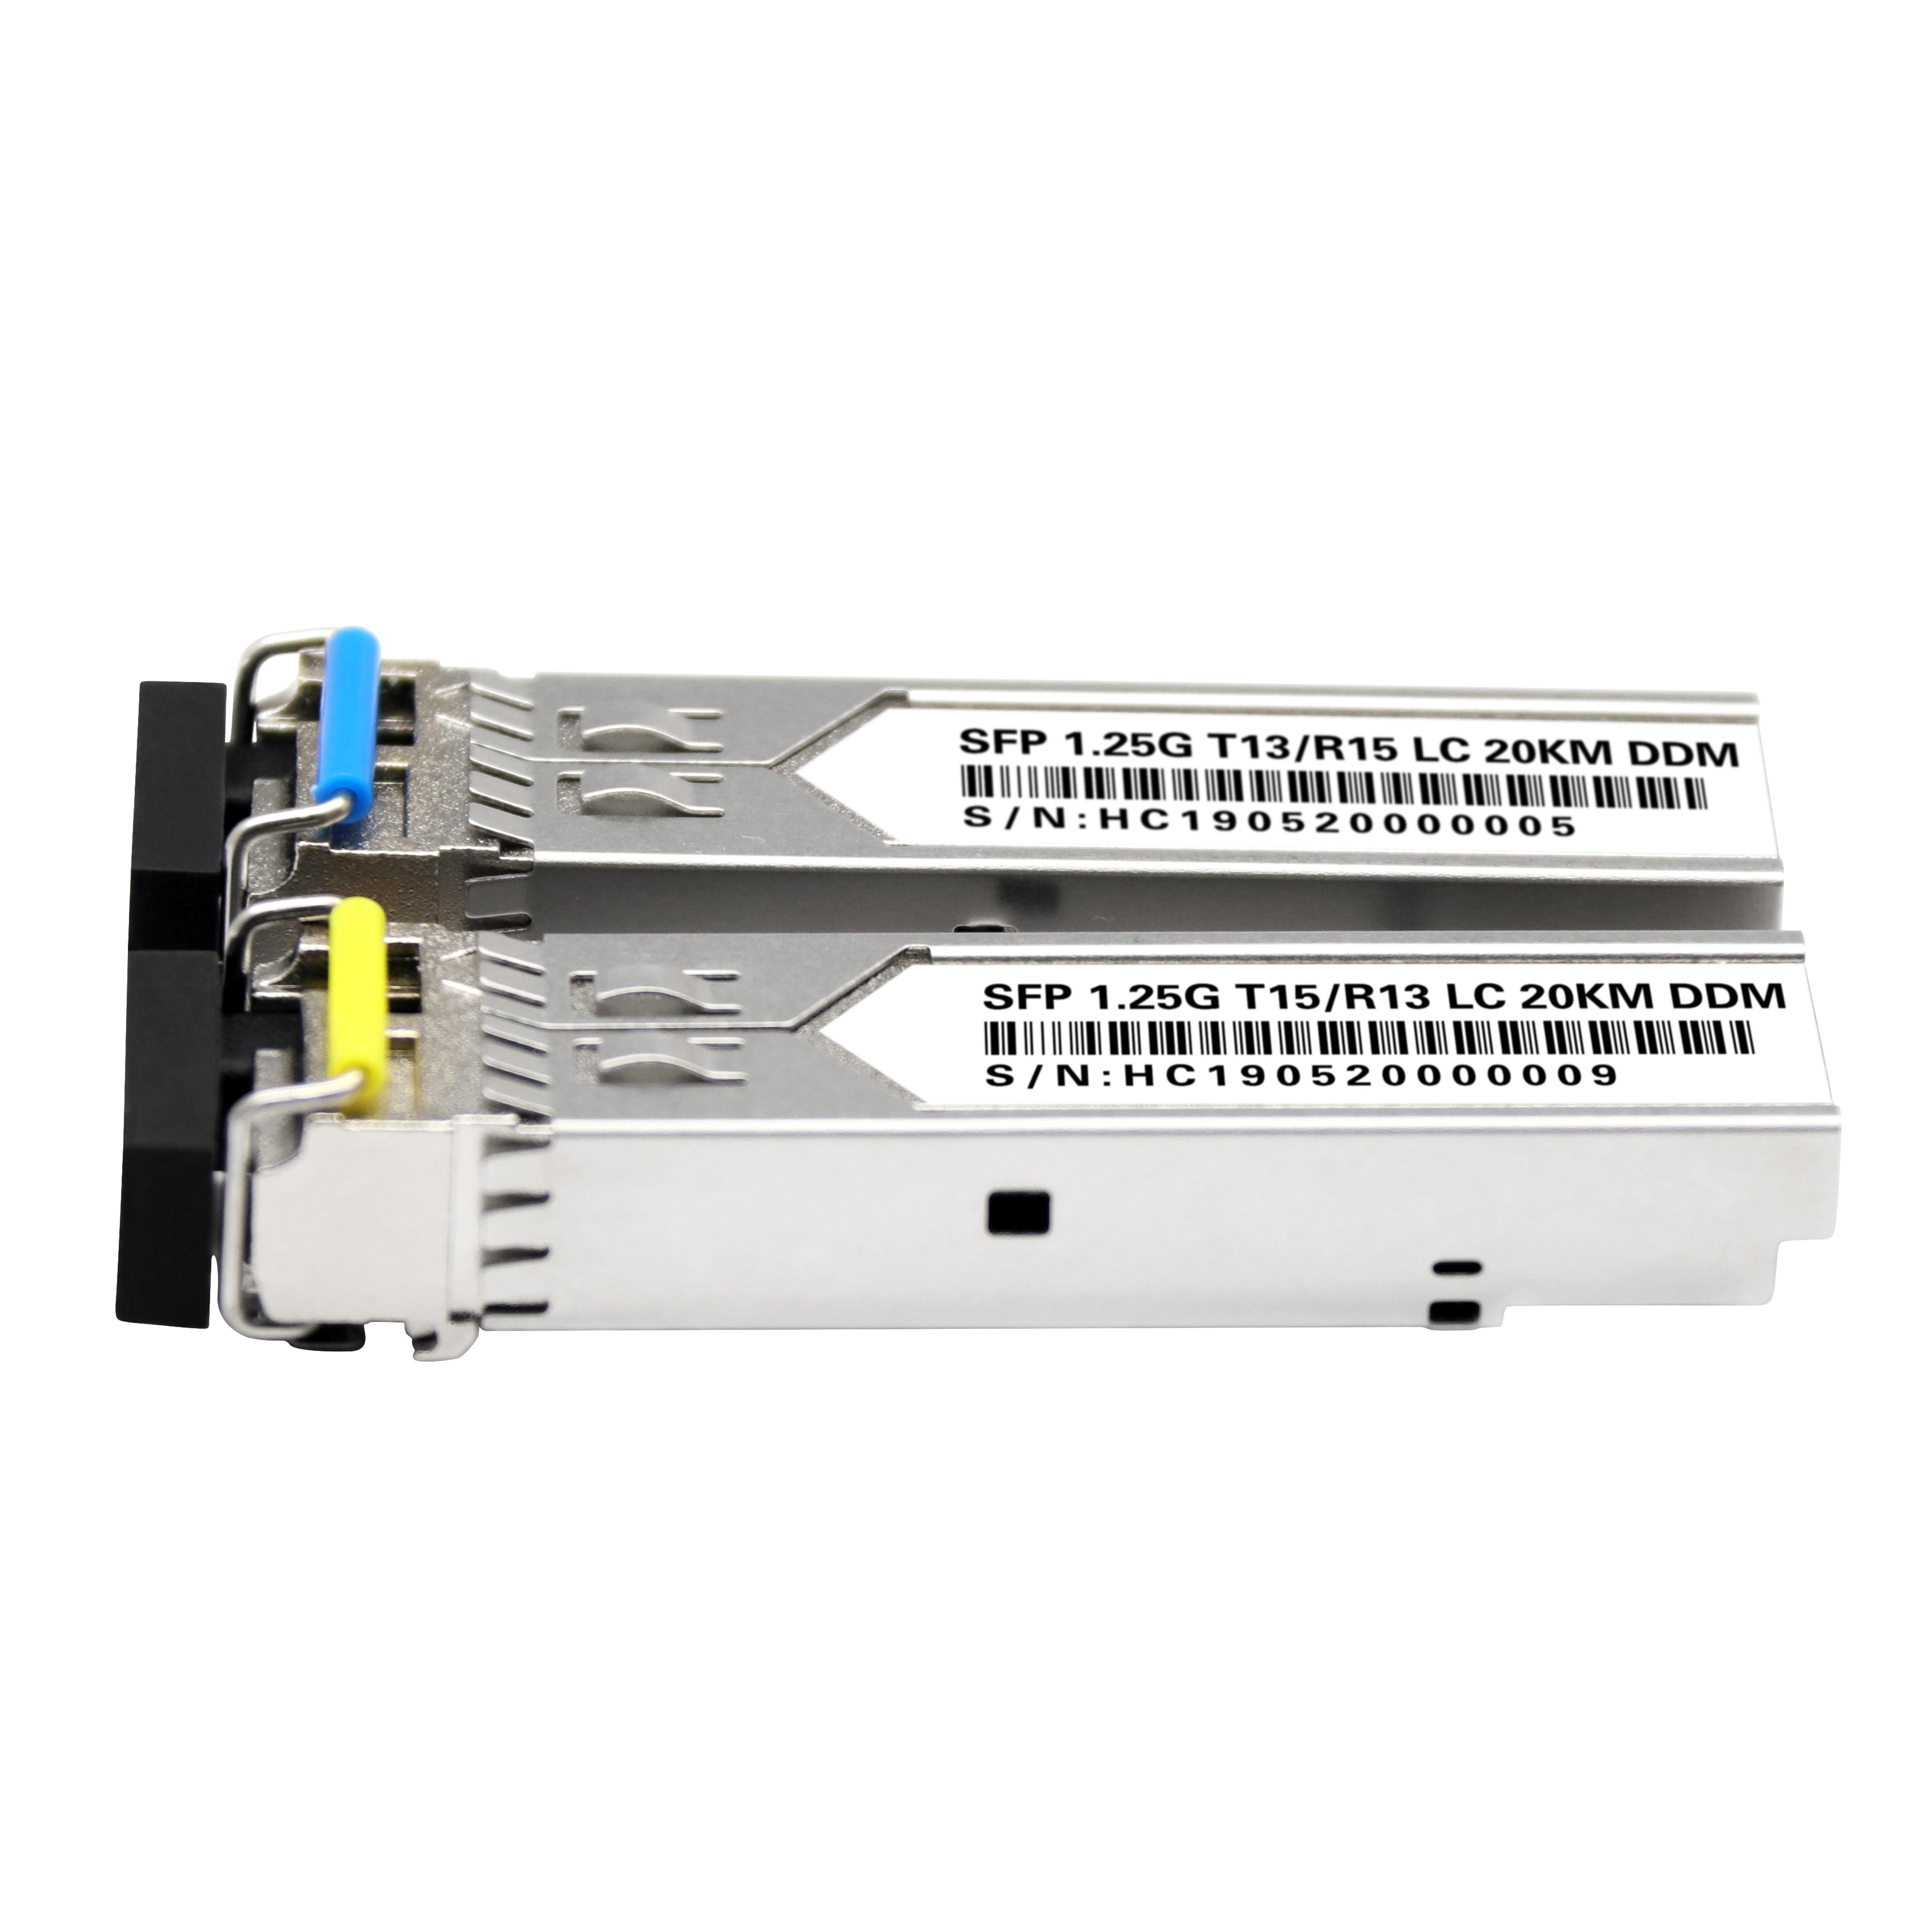 Single Fiber 1.25G 1310/1550 20km BIDI SFP